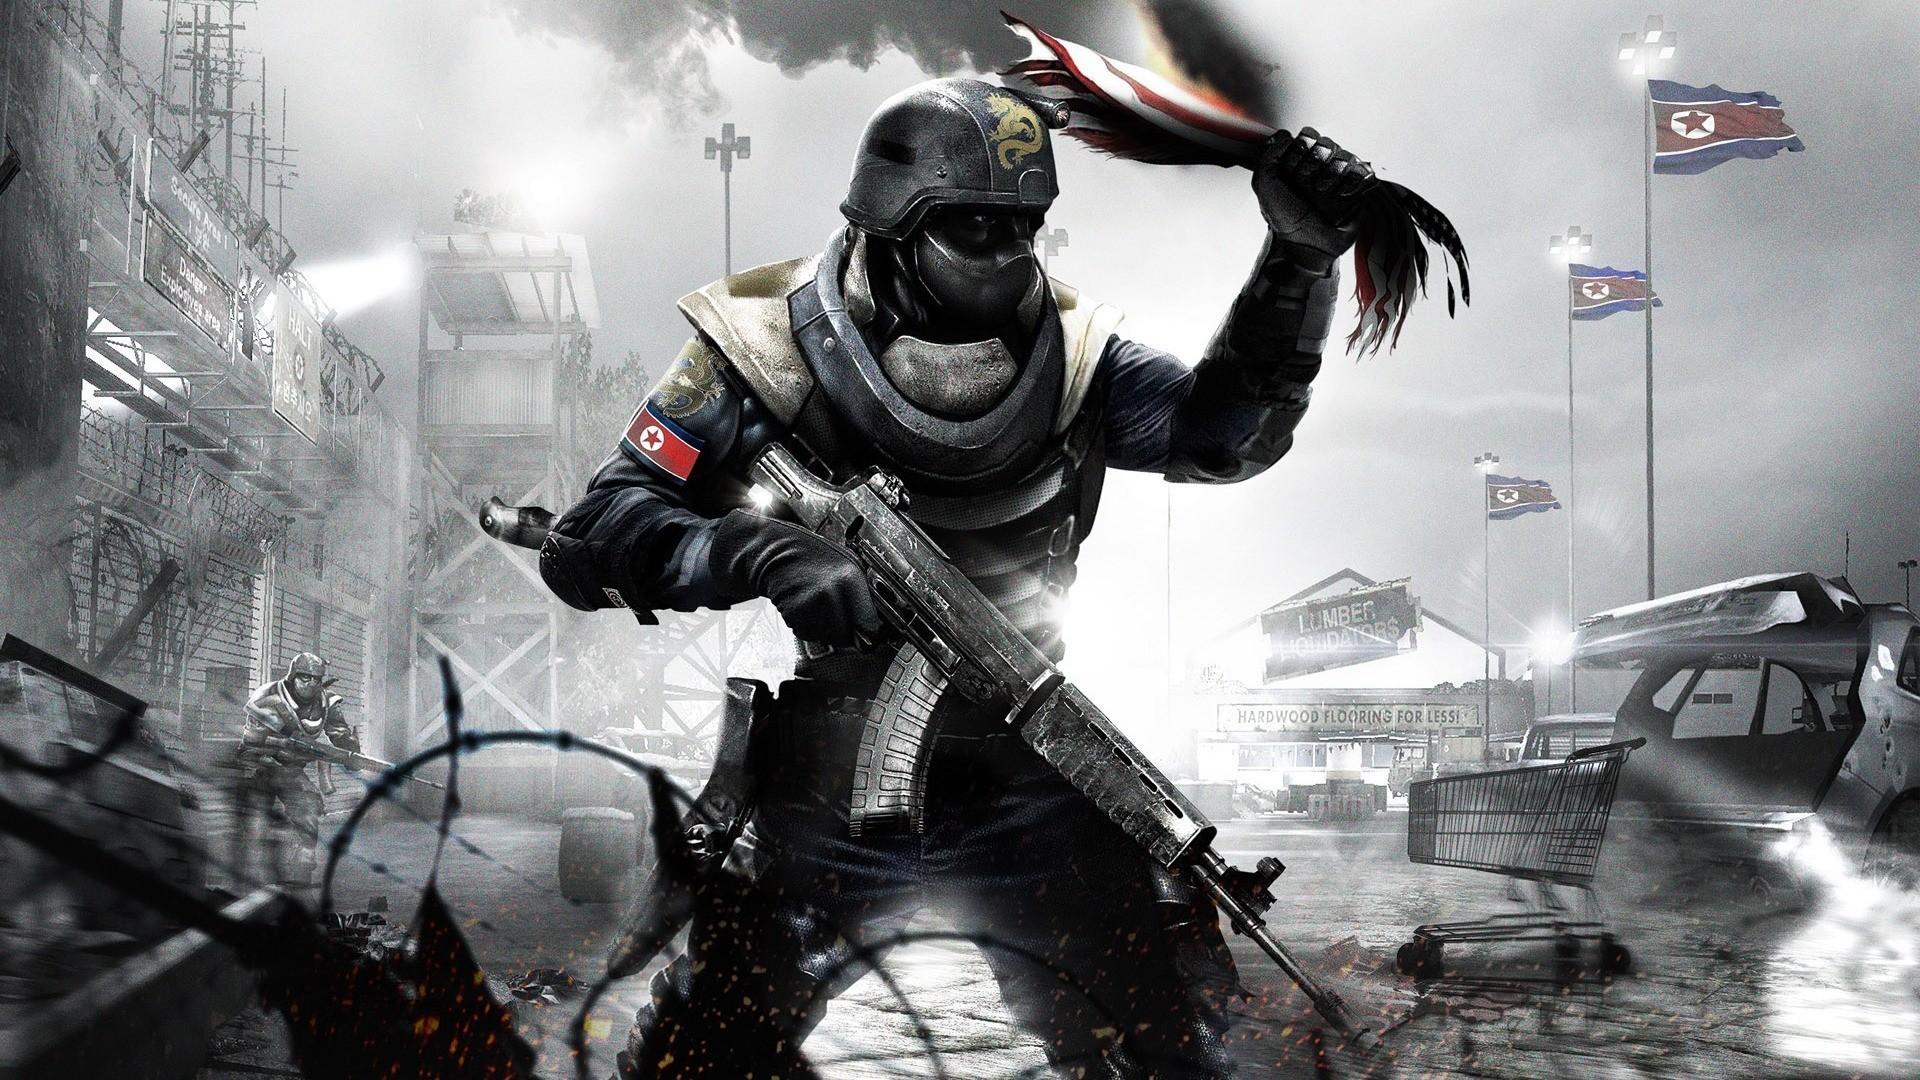 Res: 1920x1080,  Dark Souls 2 Soldier wallpaper in HD download for free. Desktop &  Mobile Sizes